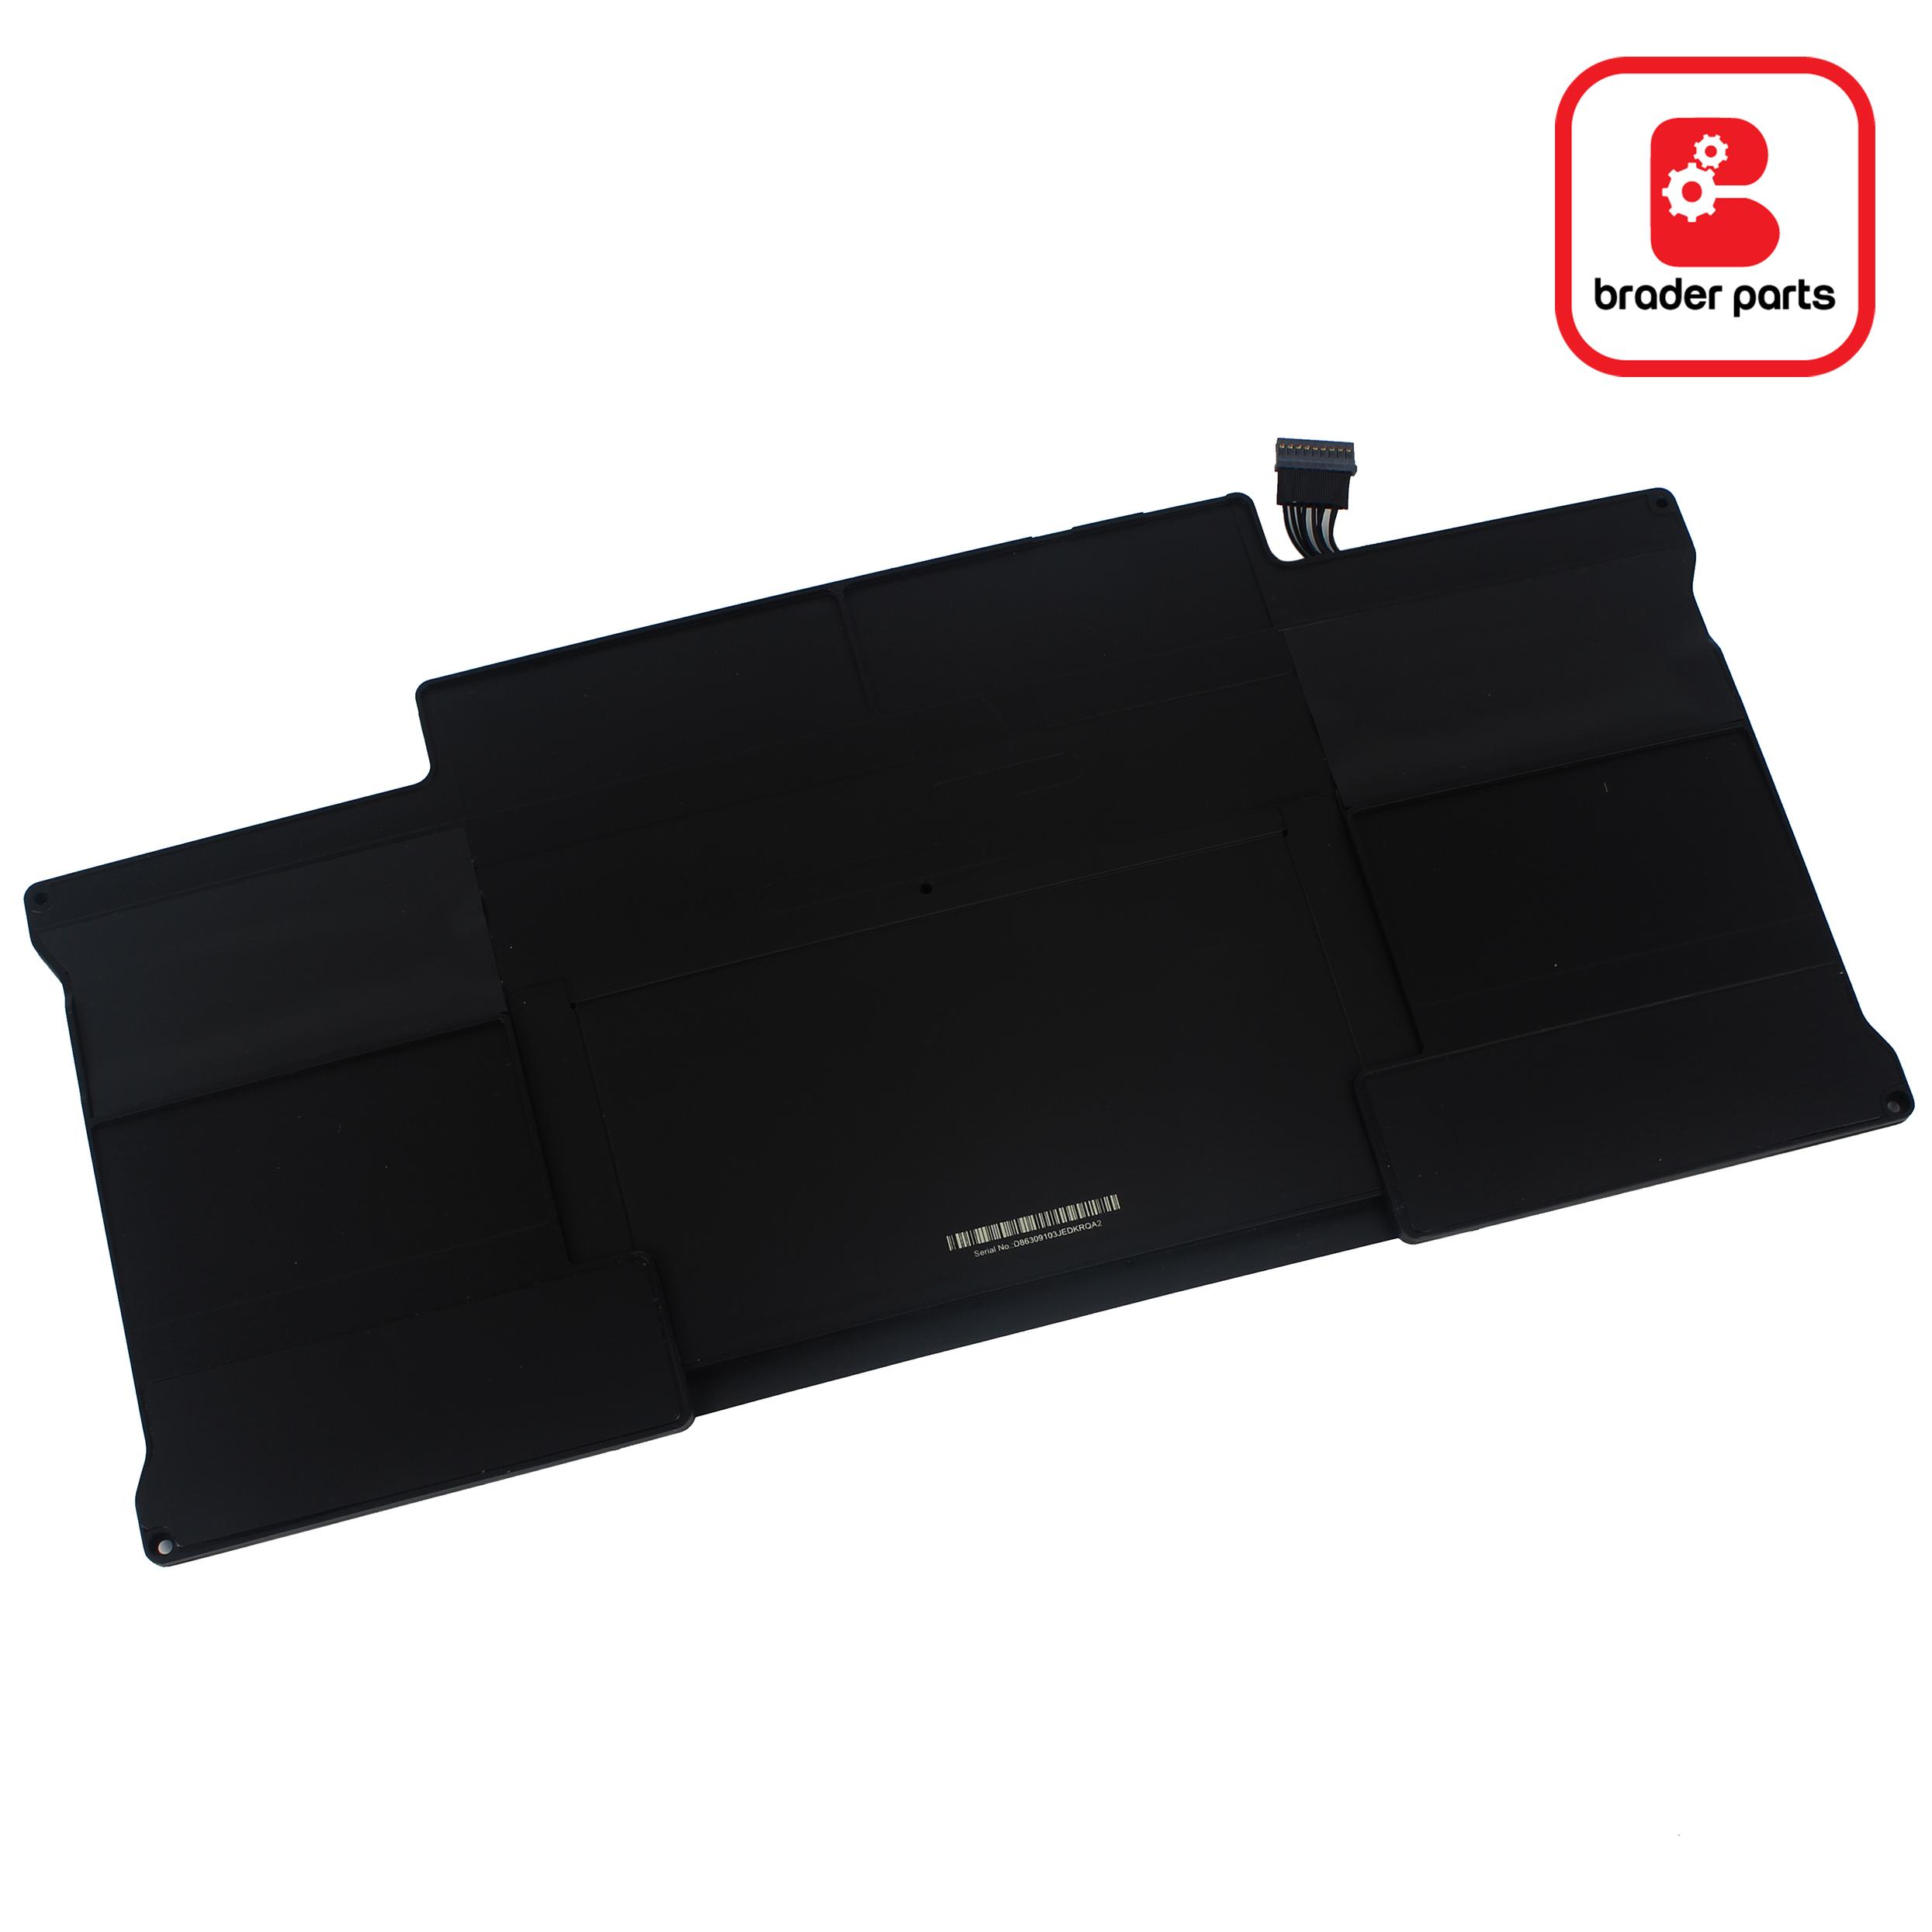 "Baterai Macbook Air 13"" A1369 /A1466 (A1405)"